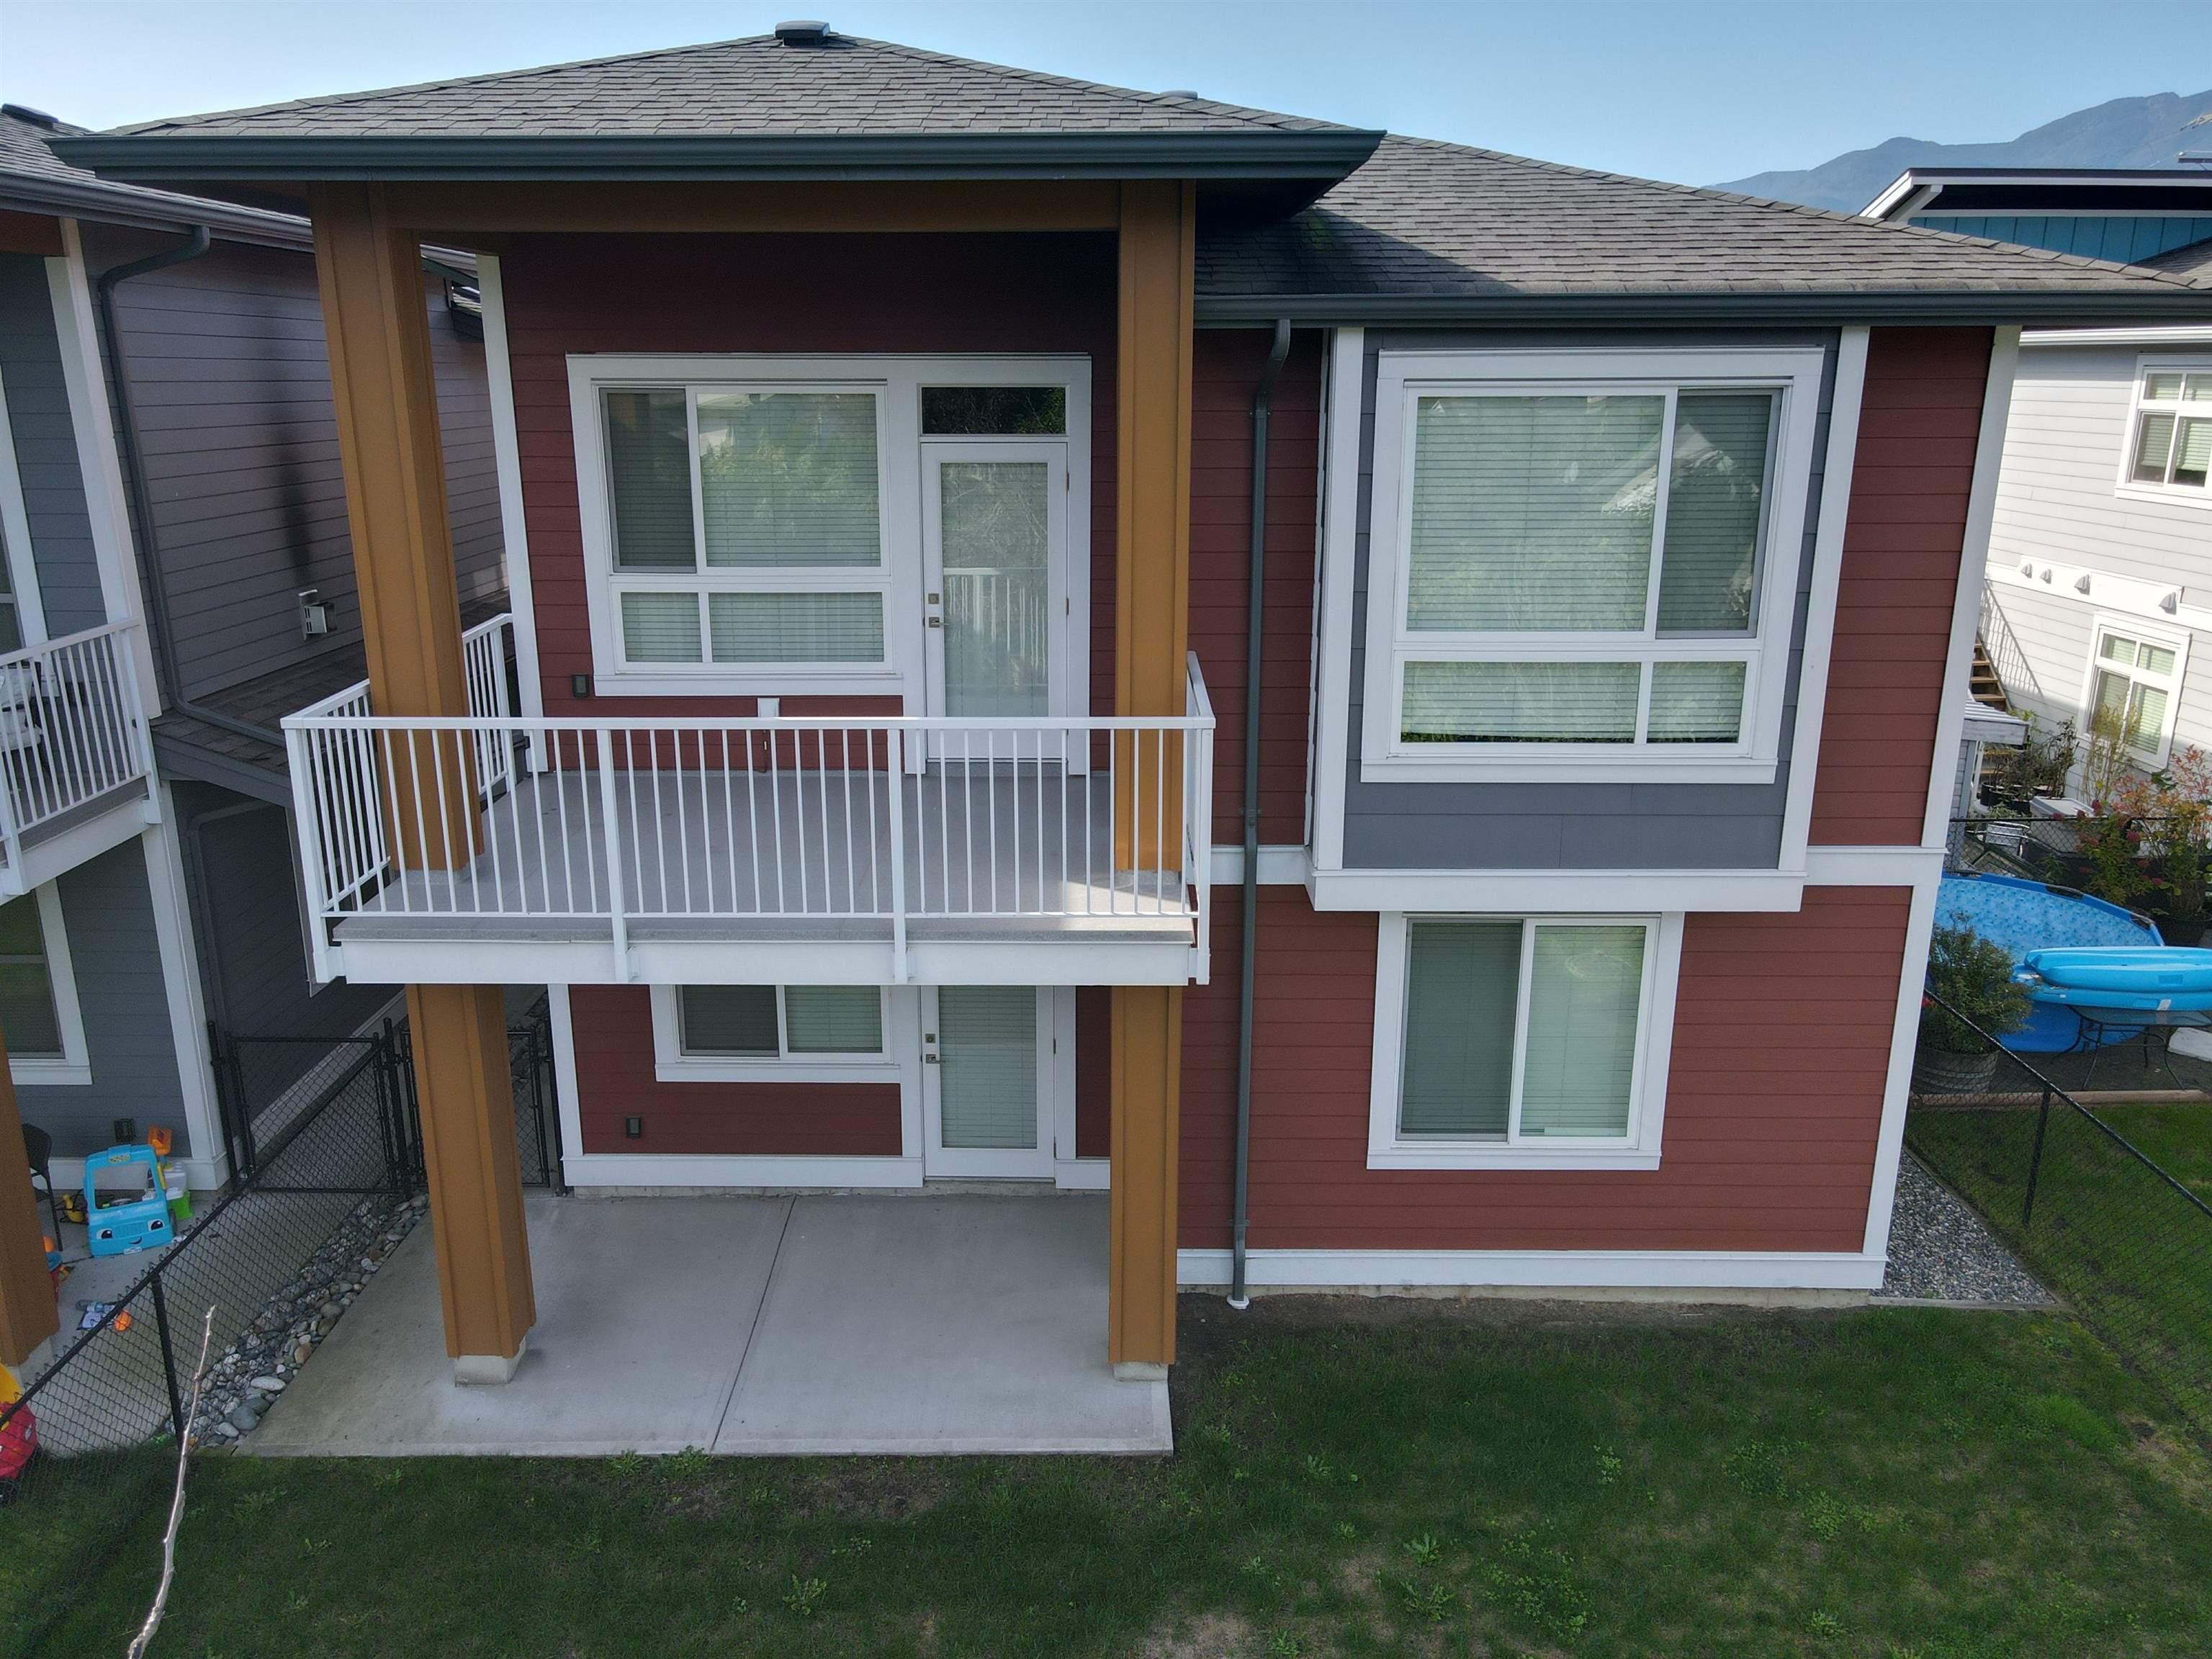 10144 KILLARNEY DRIVE - Fairfield Island House/Single Family for sale, 5 Bedrooms (R2625716) - #5